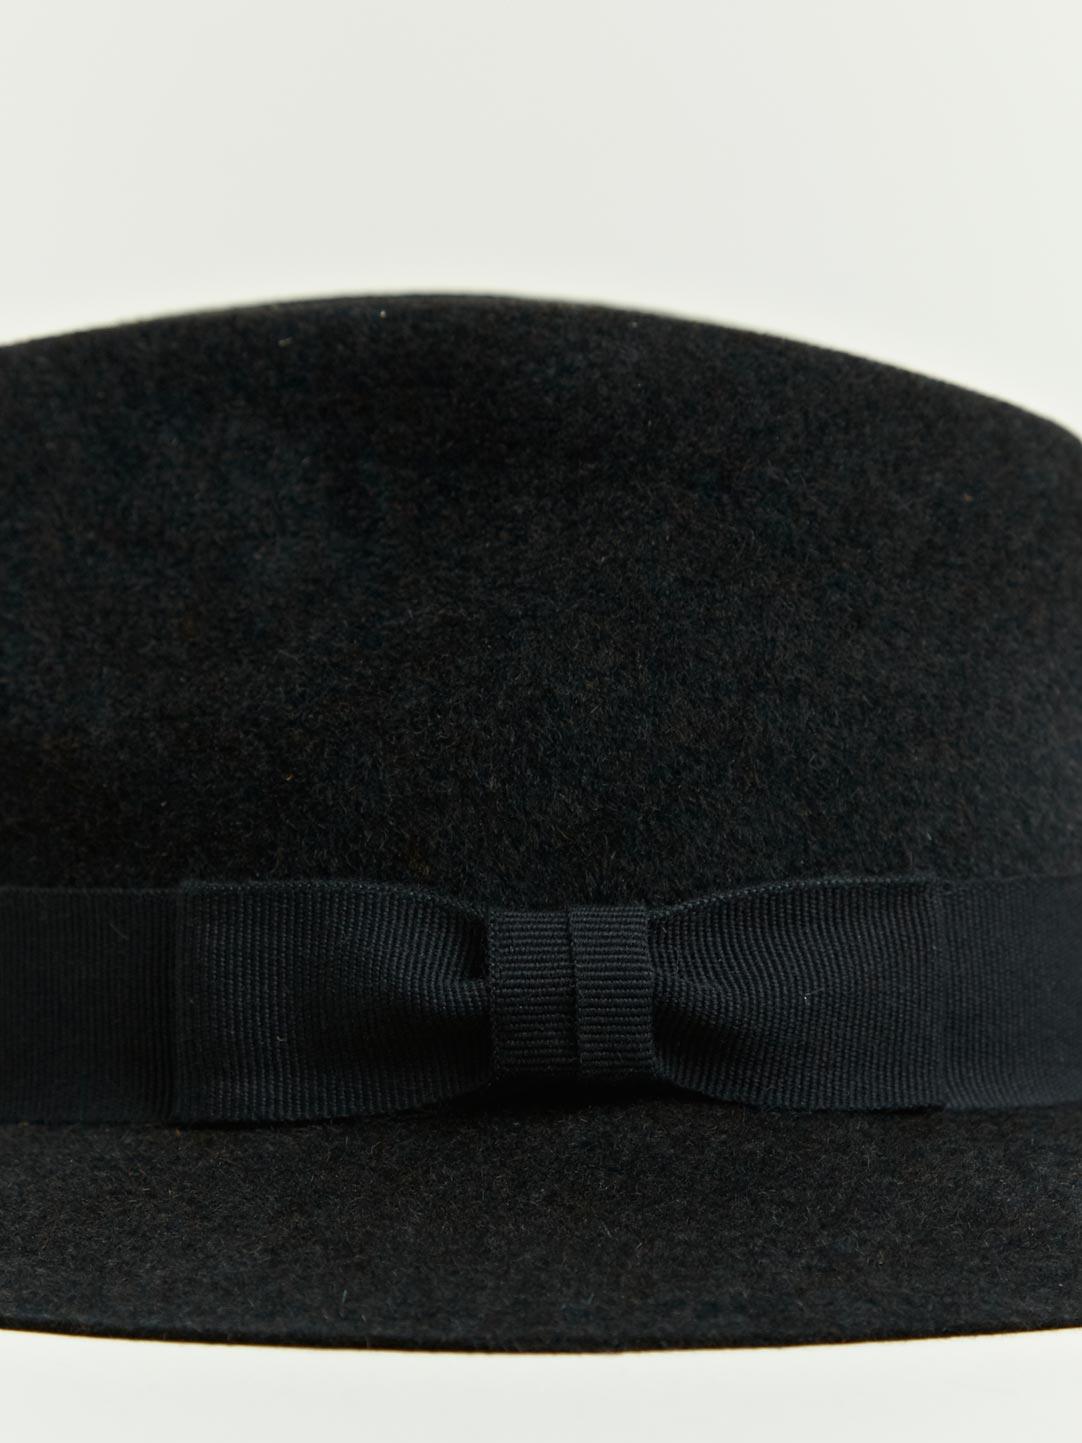 Lanvin Shape Rabbit Felt Hat In Black For Men Lyst